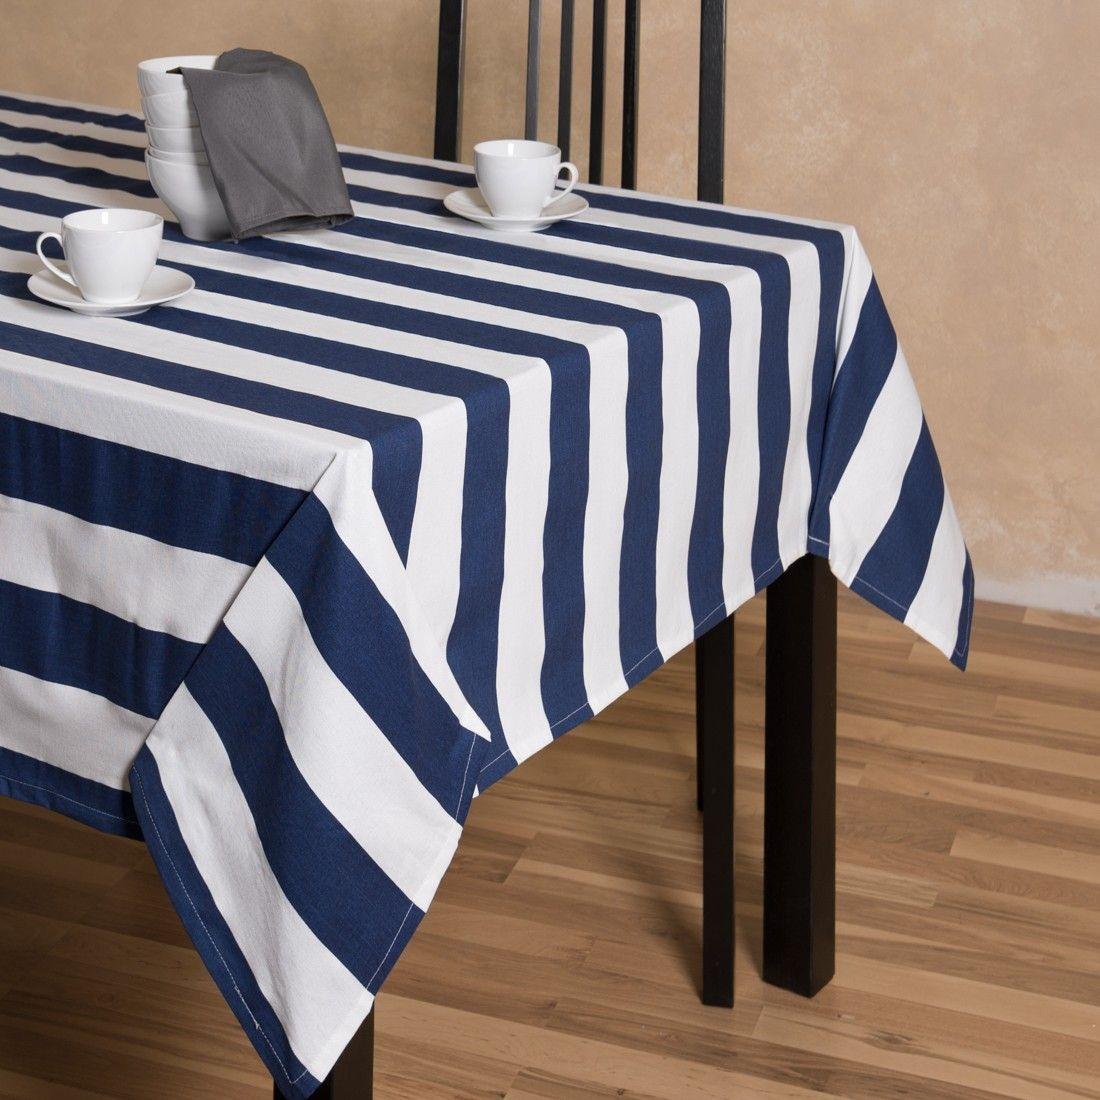 Elegant Trellis Rectangular Cotton Tablecloth Black White. Blue Striped Tablecloth